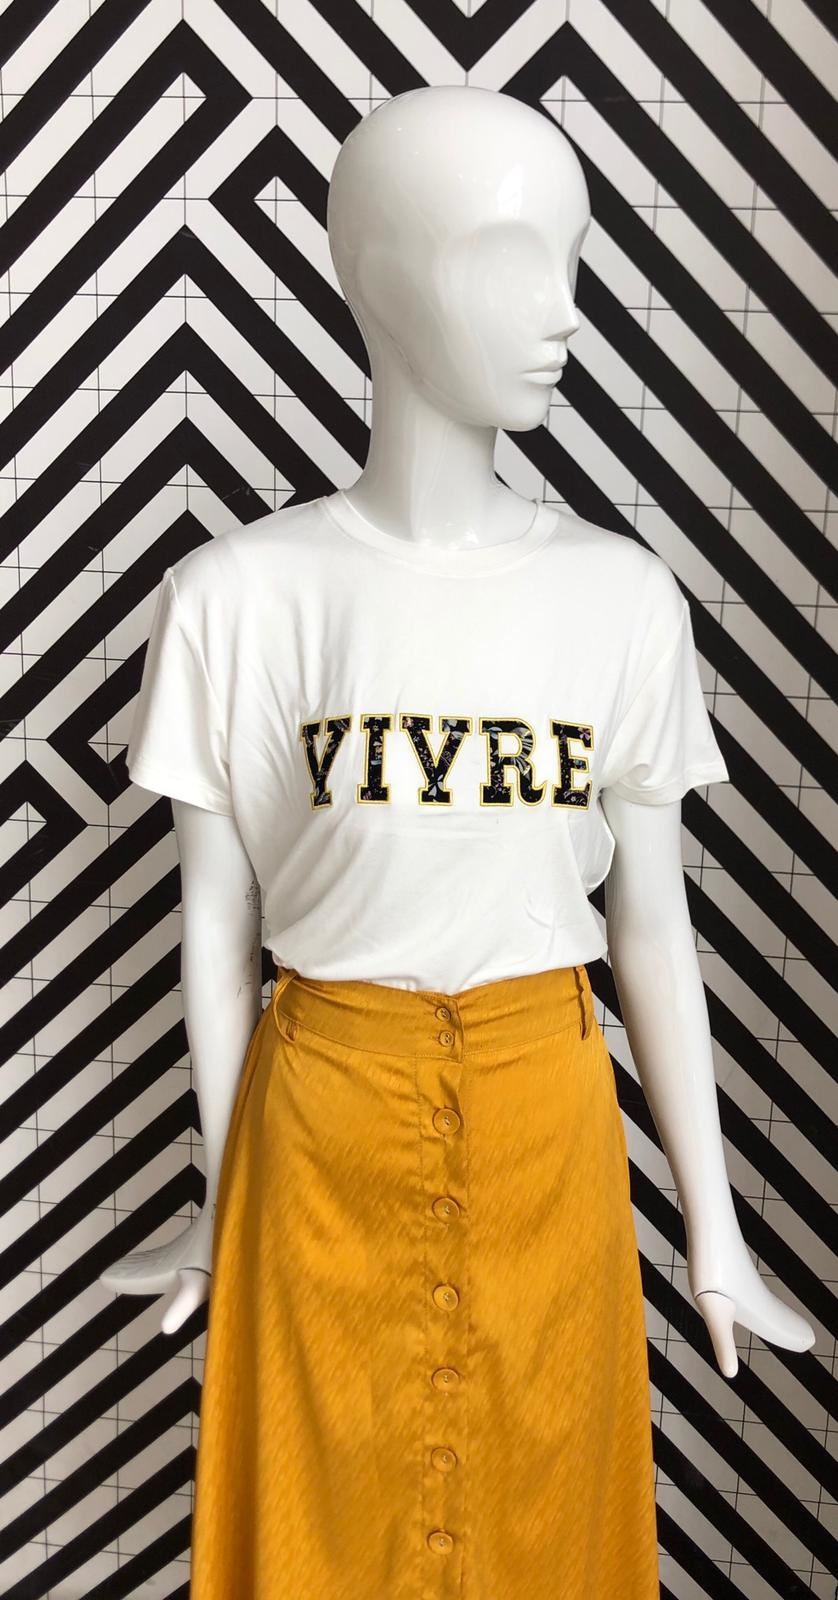 Voyar La Rue Tilda vivre tshirt offwhite